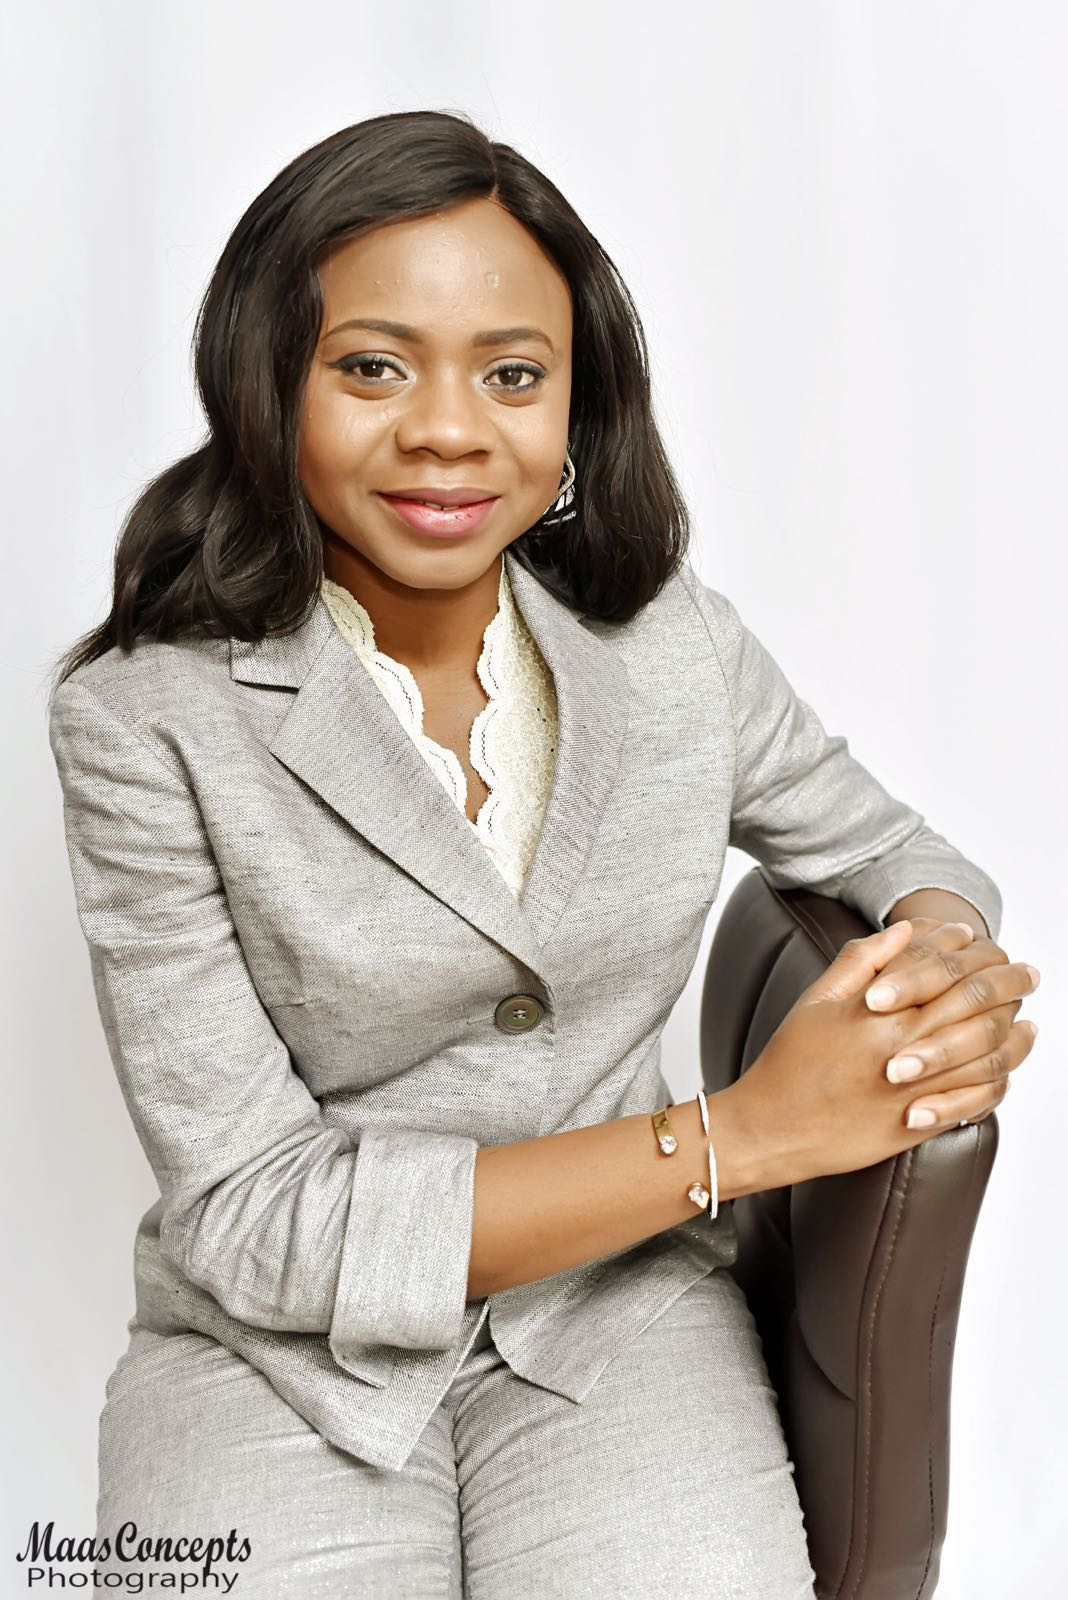 Dr. Adeola Olubamiji